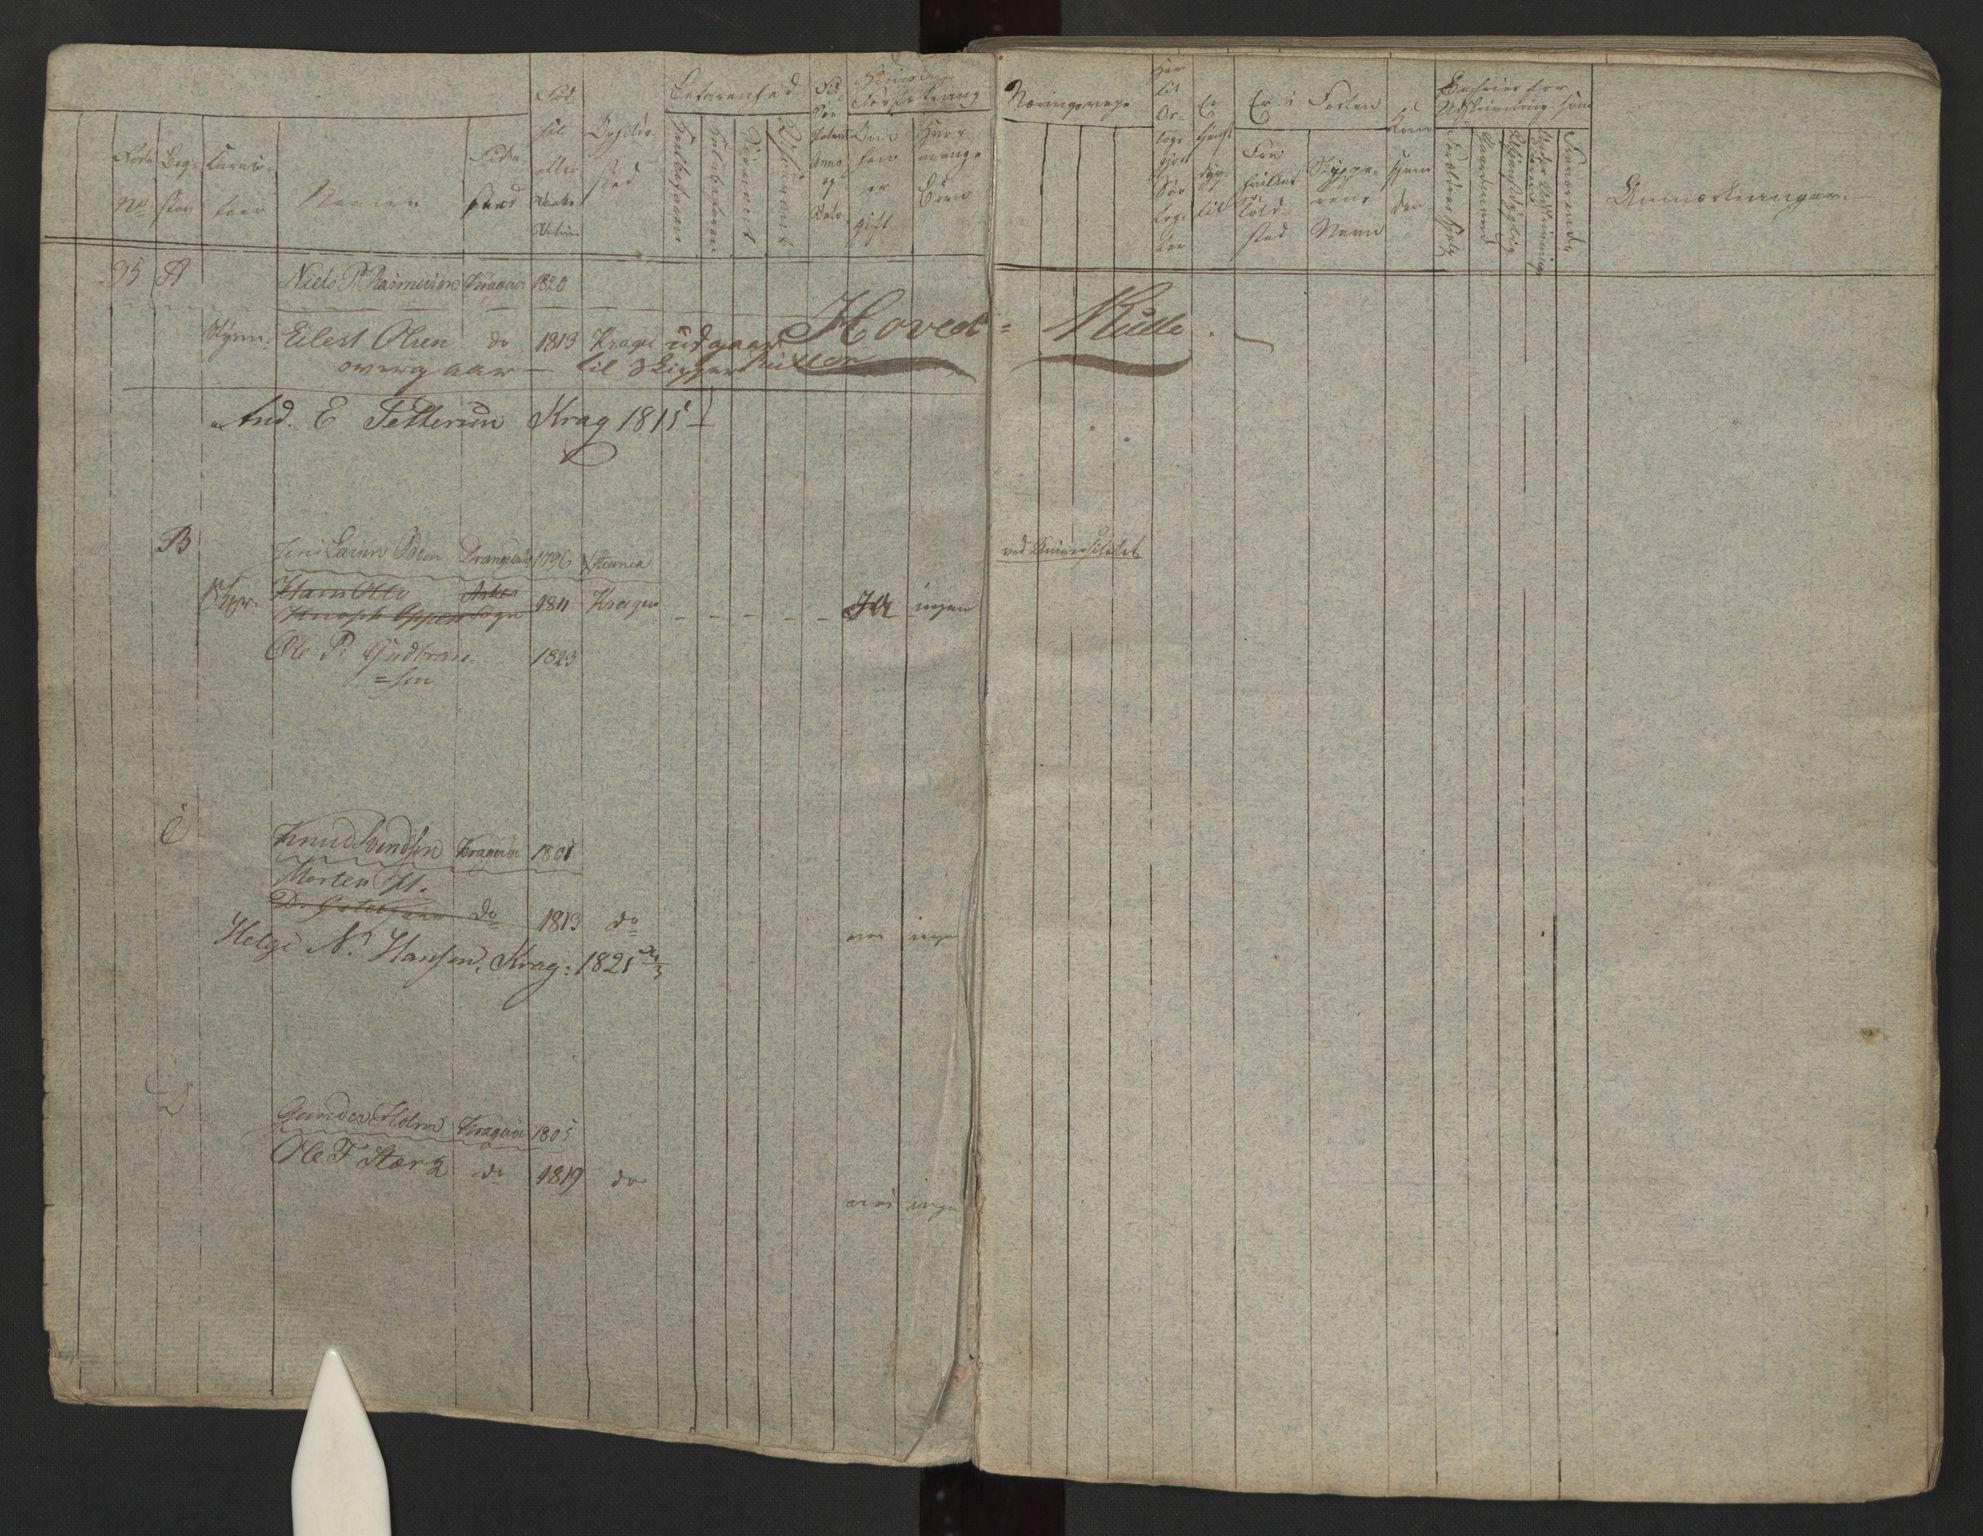 SAKO, Kragerø innrulleringskontor, F/Fa/L0001: Hoved- og ekstrarulle, 1824, s. 2